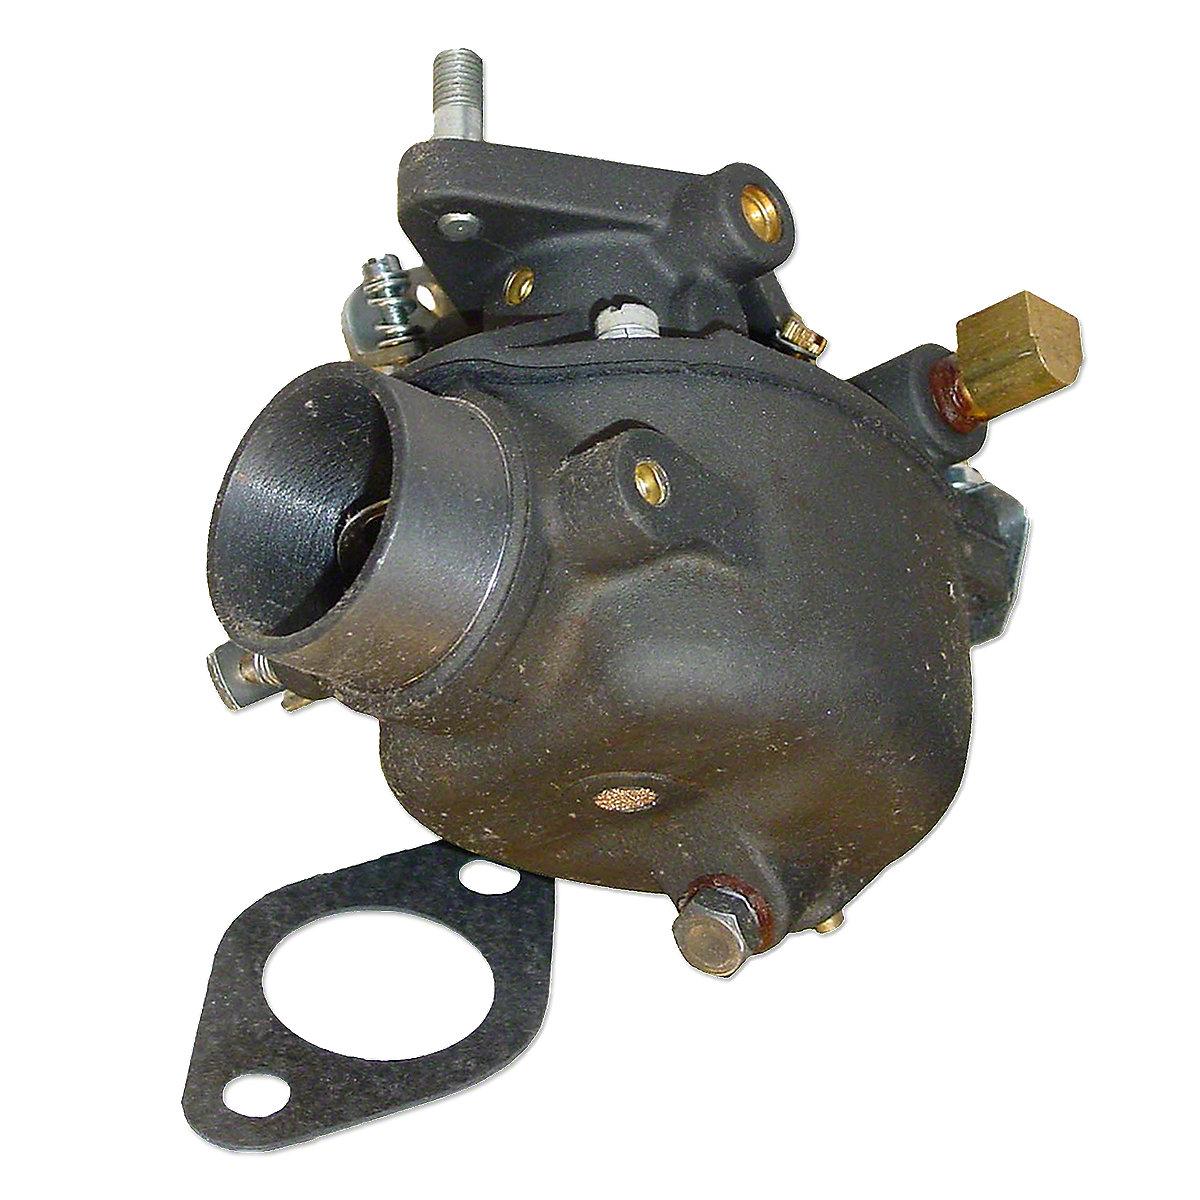 New Marvel Schebler Style Carburetor For Massey Ferguson: TO35, 35, 40, 50, 150, 202, 204, 135, 2135, Massey Harris: 50.